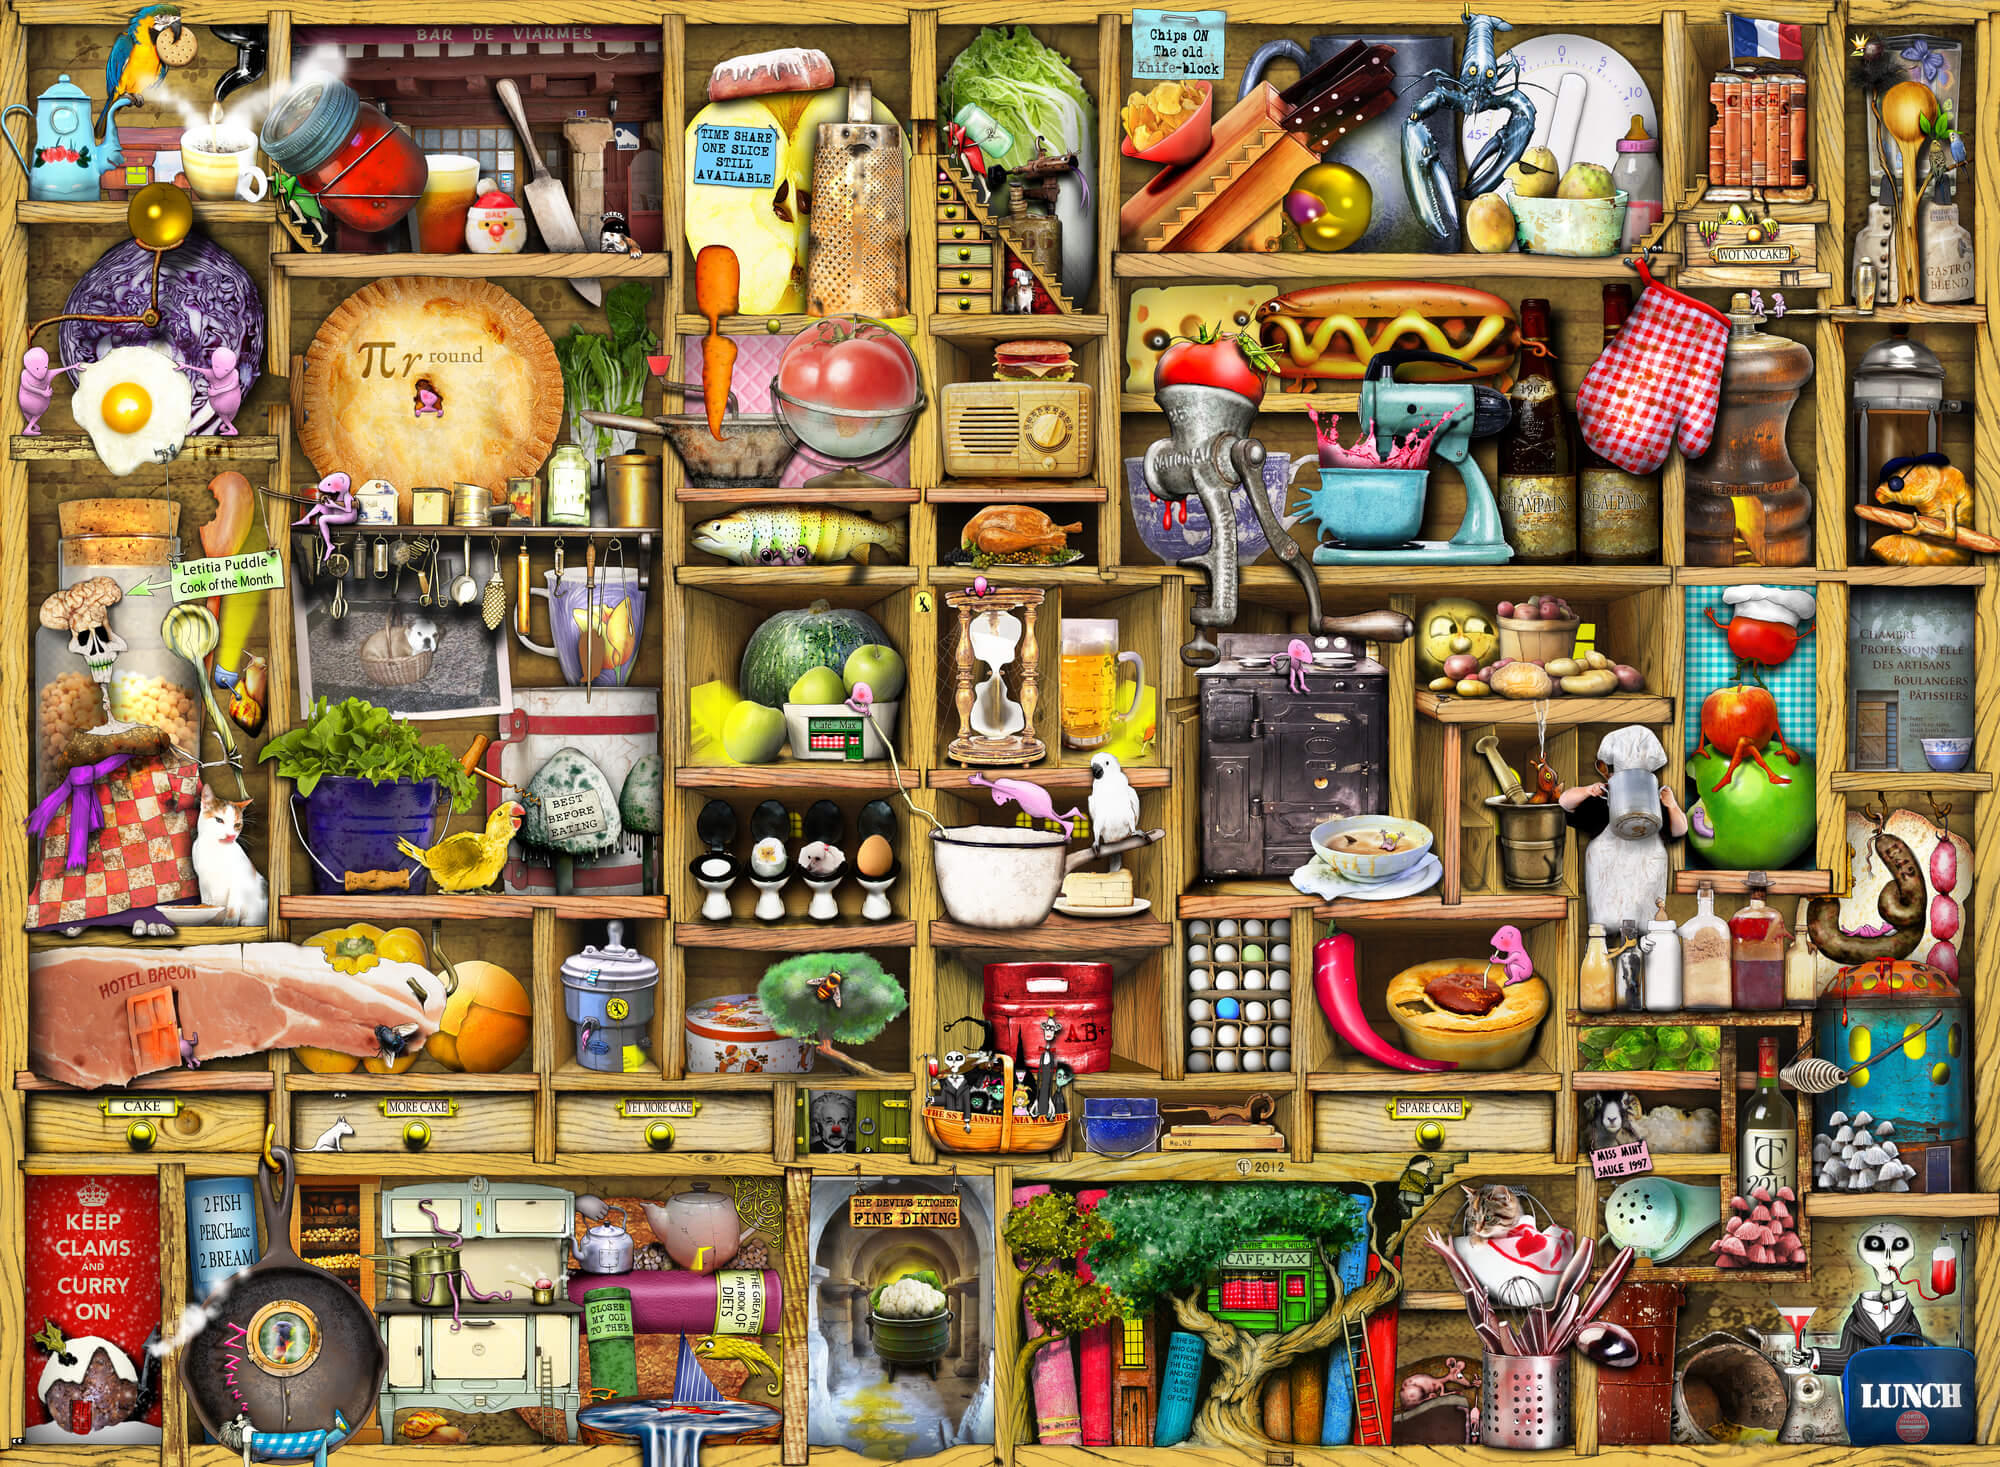 Kitchen Cupboard Mural Wallpaper